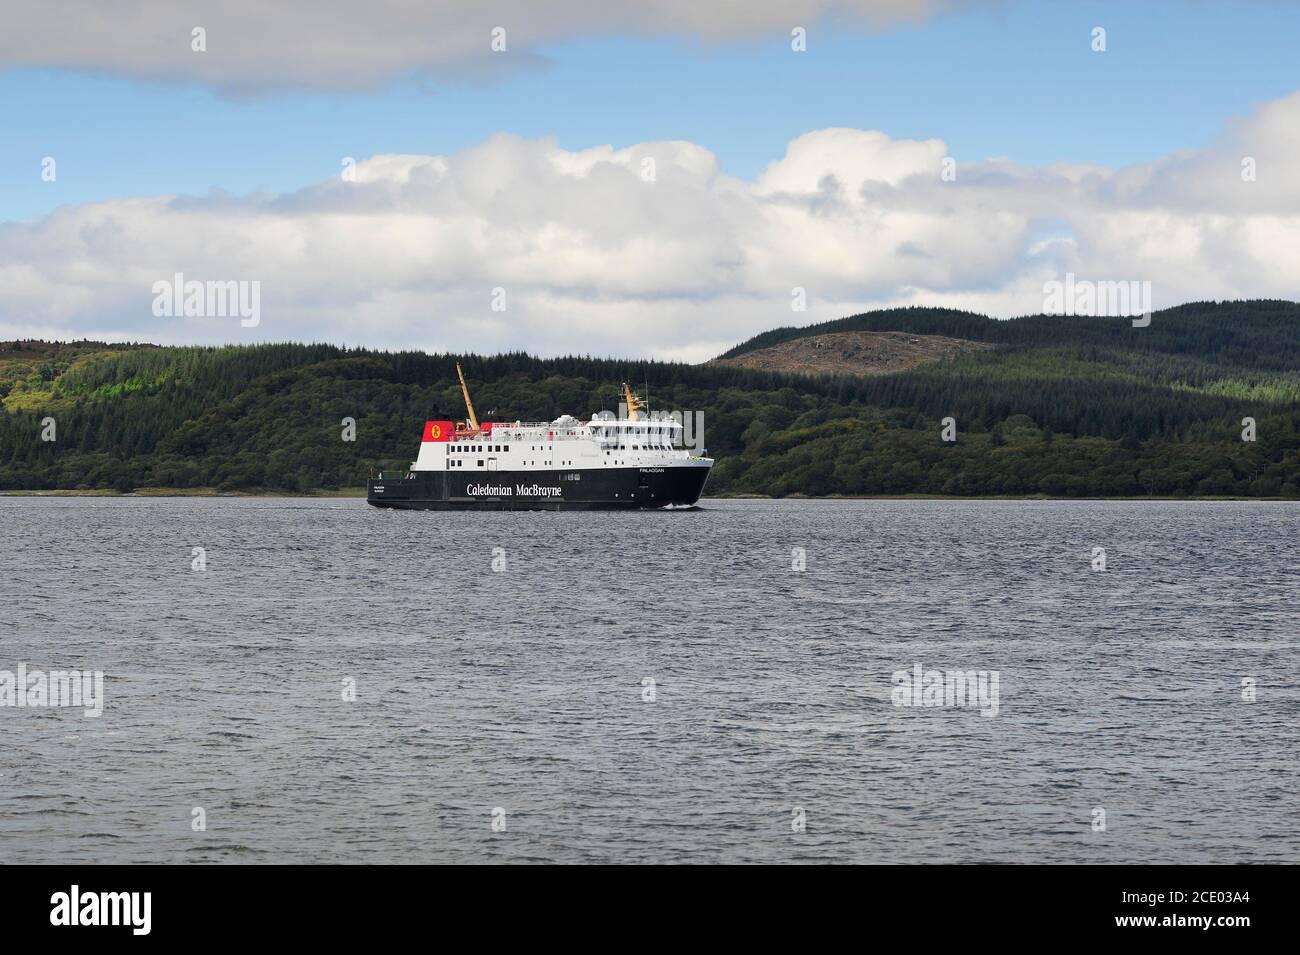 Islay Ferry Finlaggan arriving at Kennacraig Terminal Scotland UK Stock Photo